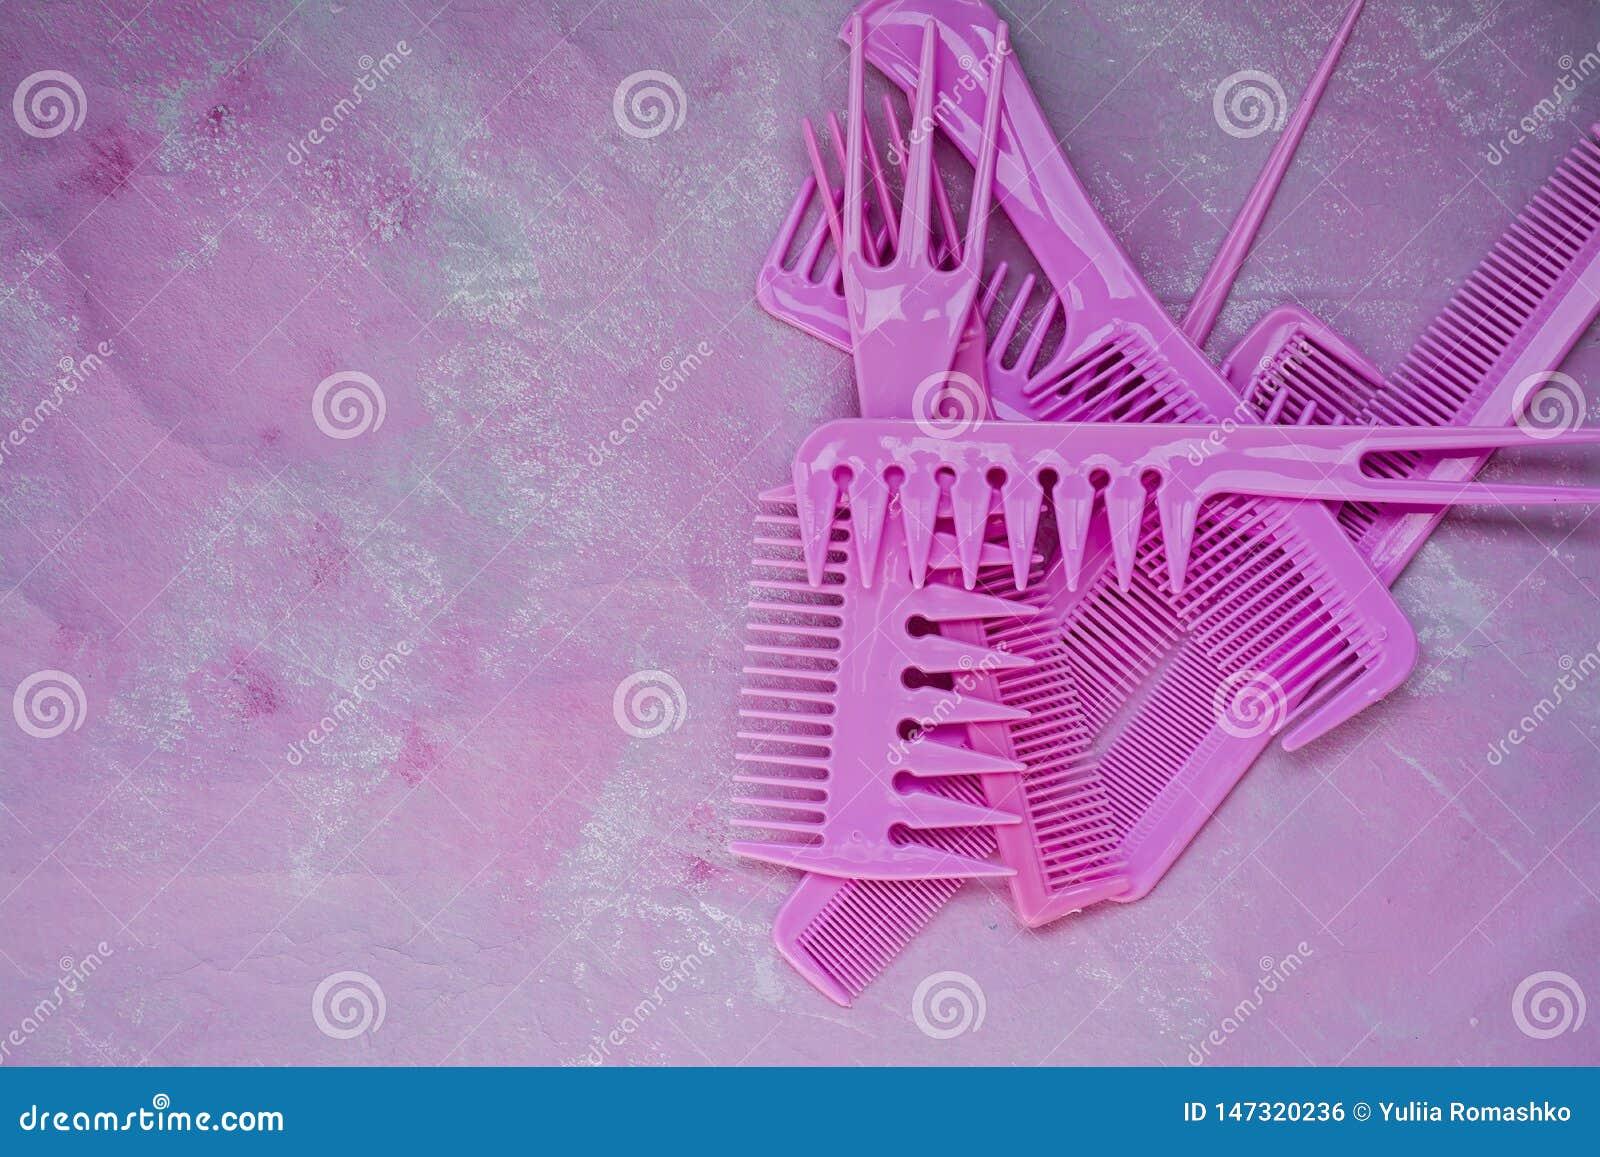 Pente brilhante cor-de-rosa para cabeleireiro Bar da beleza Ferramentas para os penteados Fundo cor-de-rosa barbershop Grupo de e